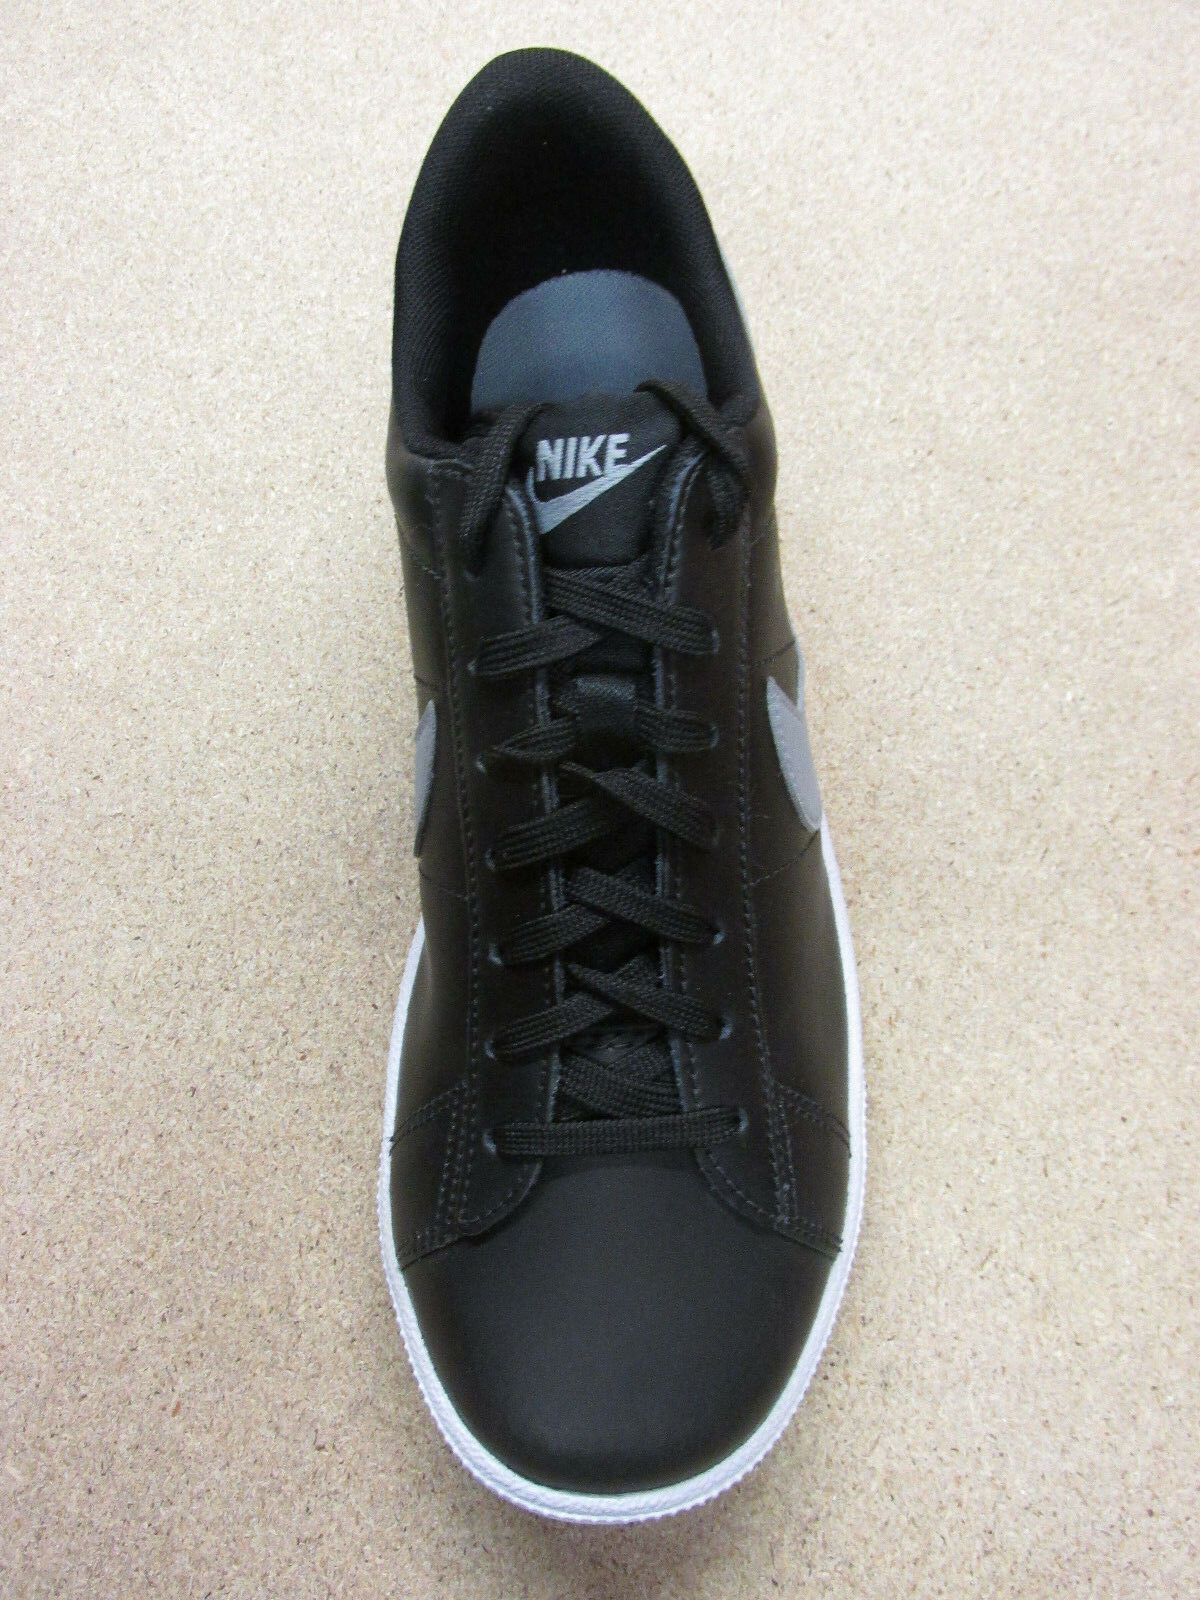 Nike Tennis 683613 Klassisch Cs Herren Turnschuhe 683613 Tennis 012 Turnschuhe 7c4b96